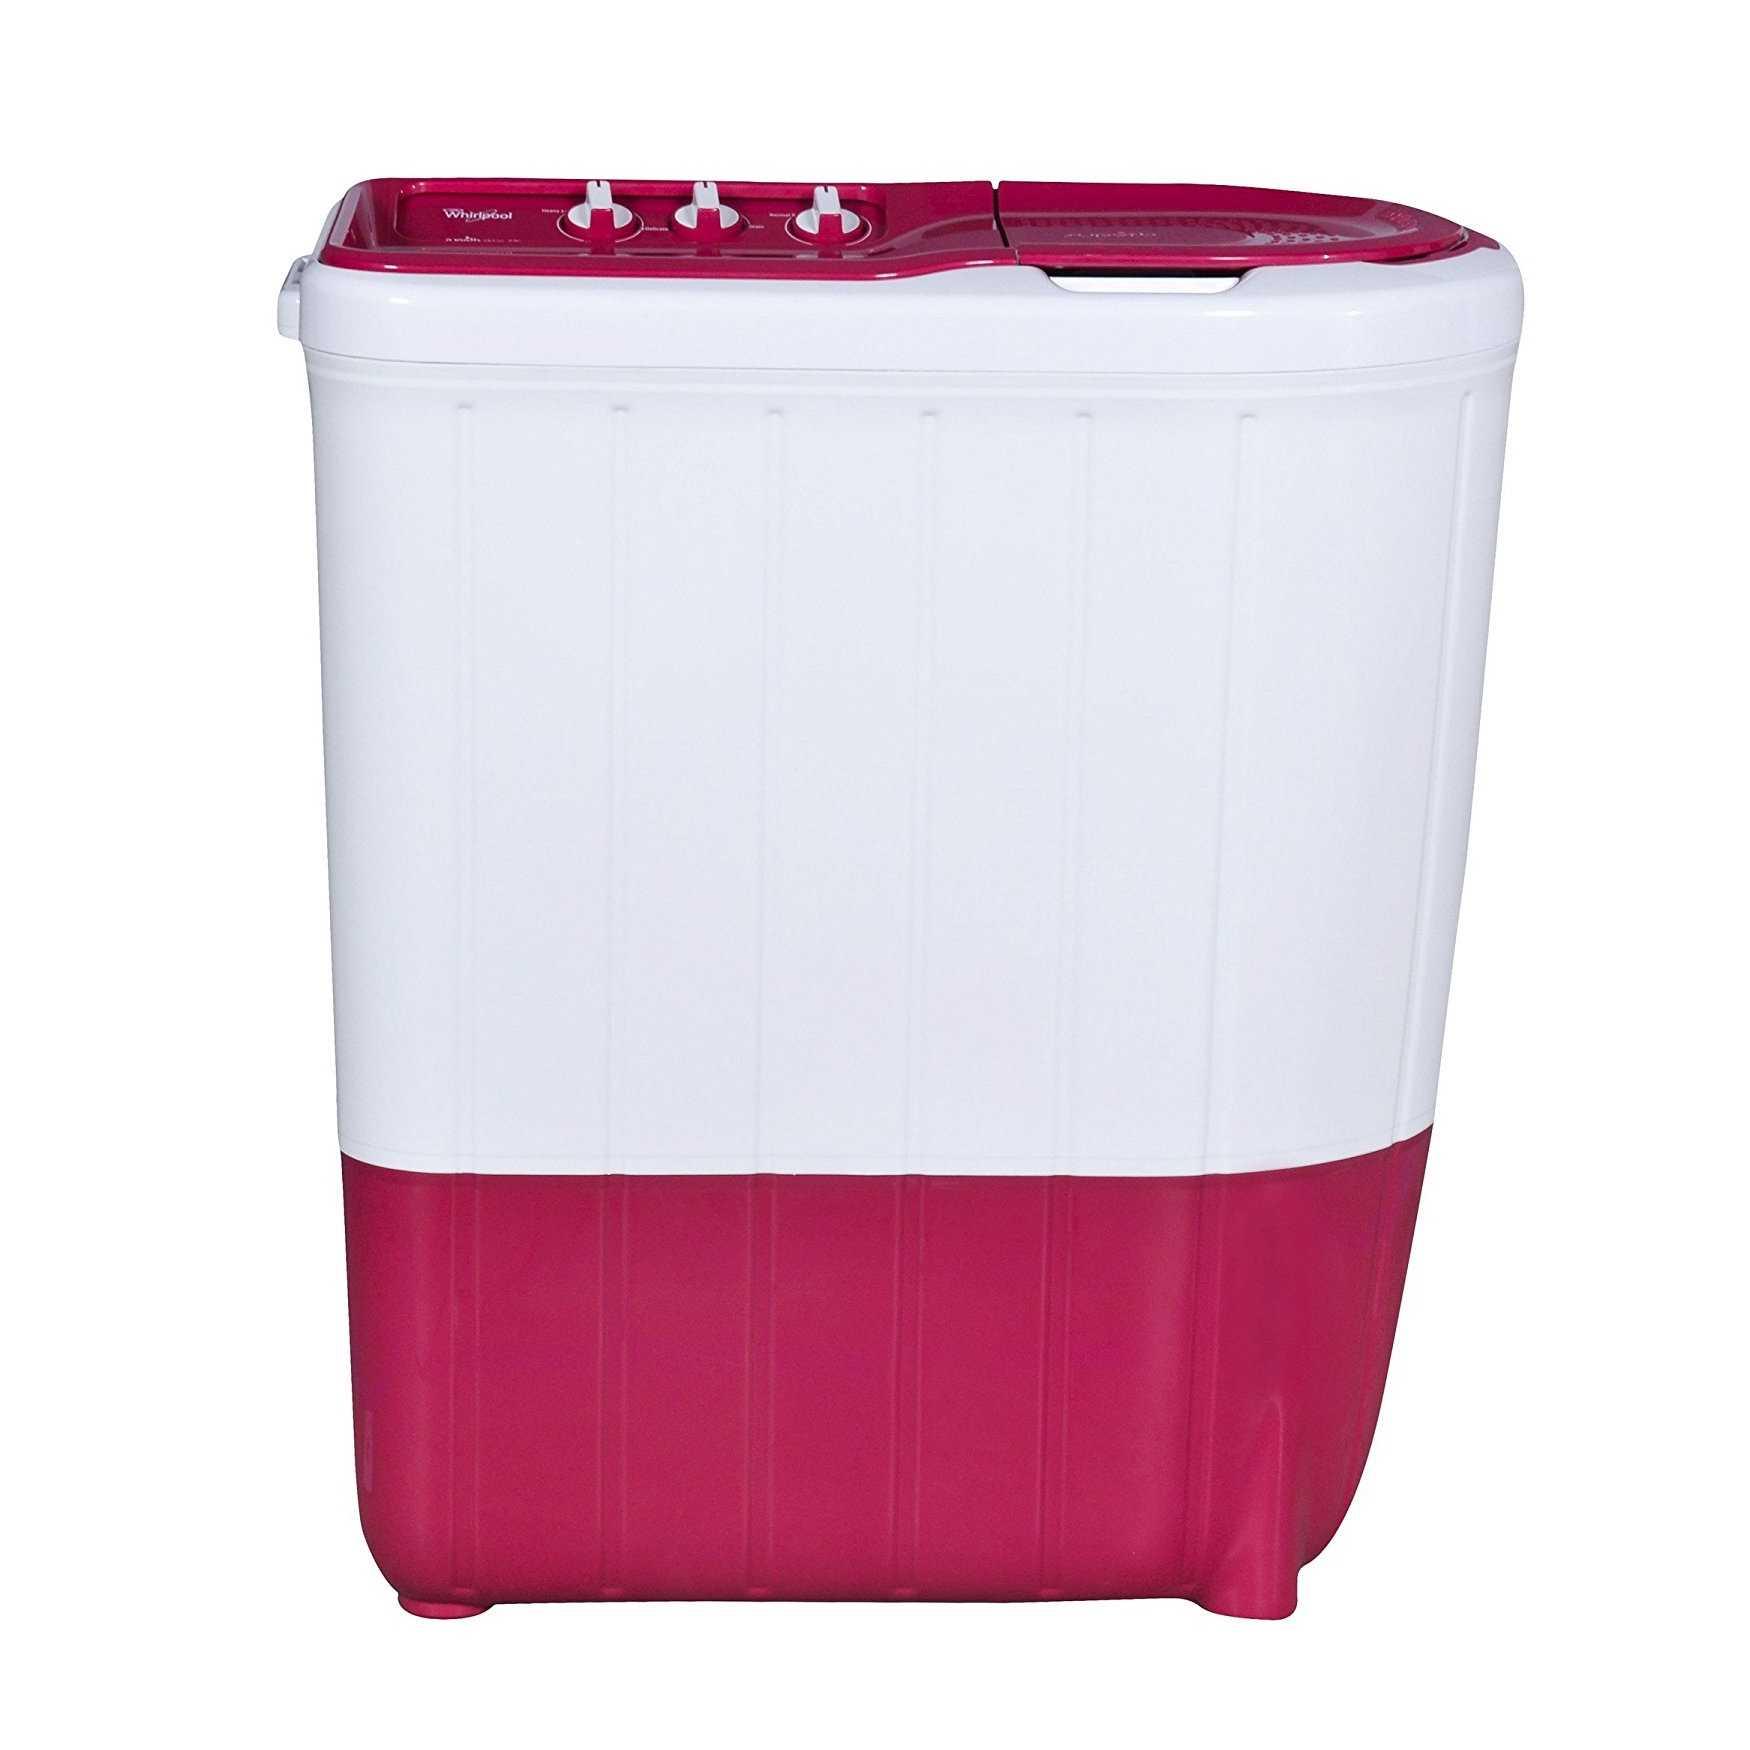 Whirlpool Superb Atom 60I 6 Kg Semi Automatic Top Loading Washing Machine